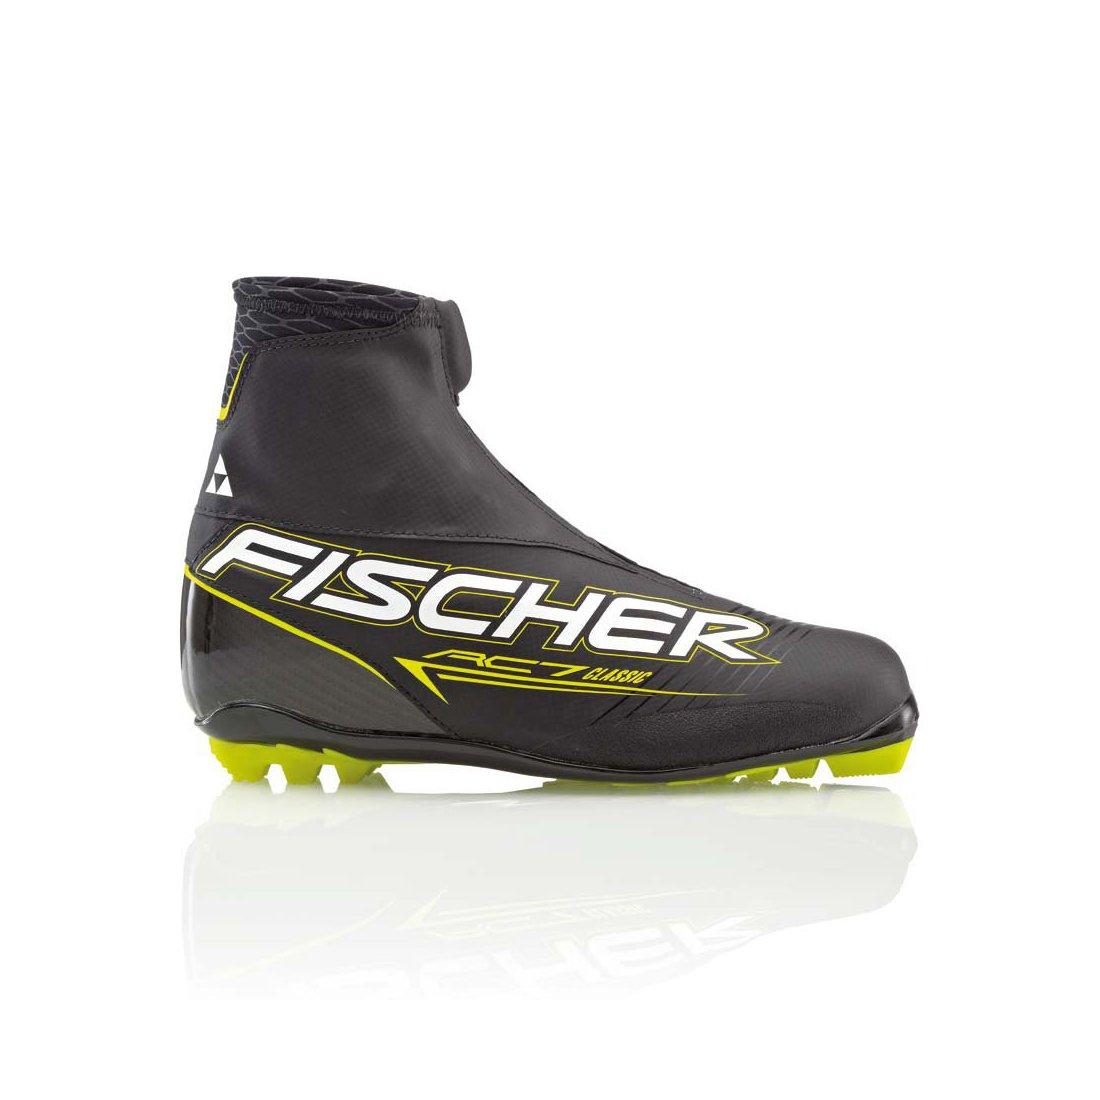 Fischer RC7 Classic 2013/14